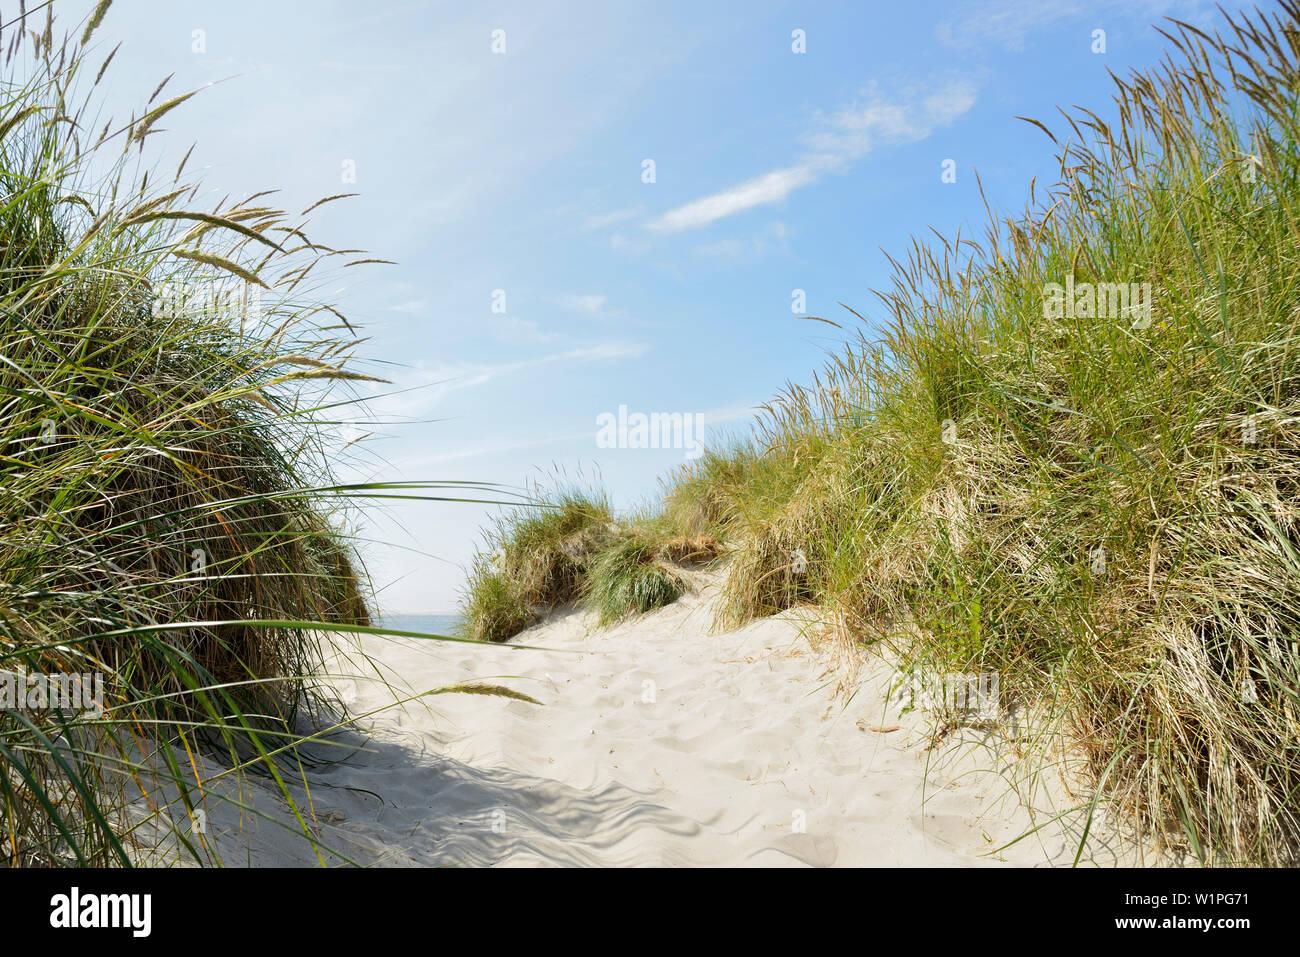 sand dune, marram grass, footpath, Baltrum, East Frisian Islands, North Sea, Aurich - district, Lower Saxony, Germany, Europe Stock Photo